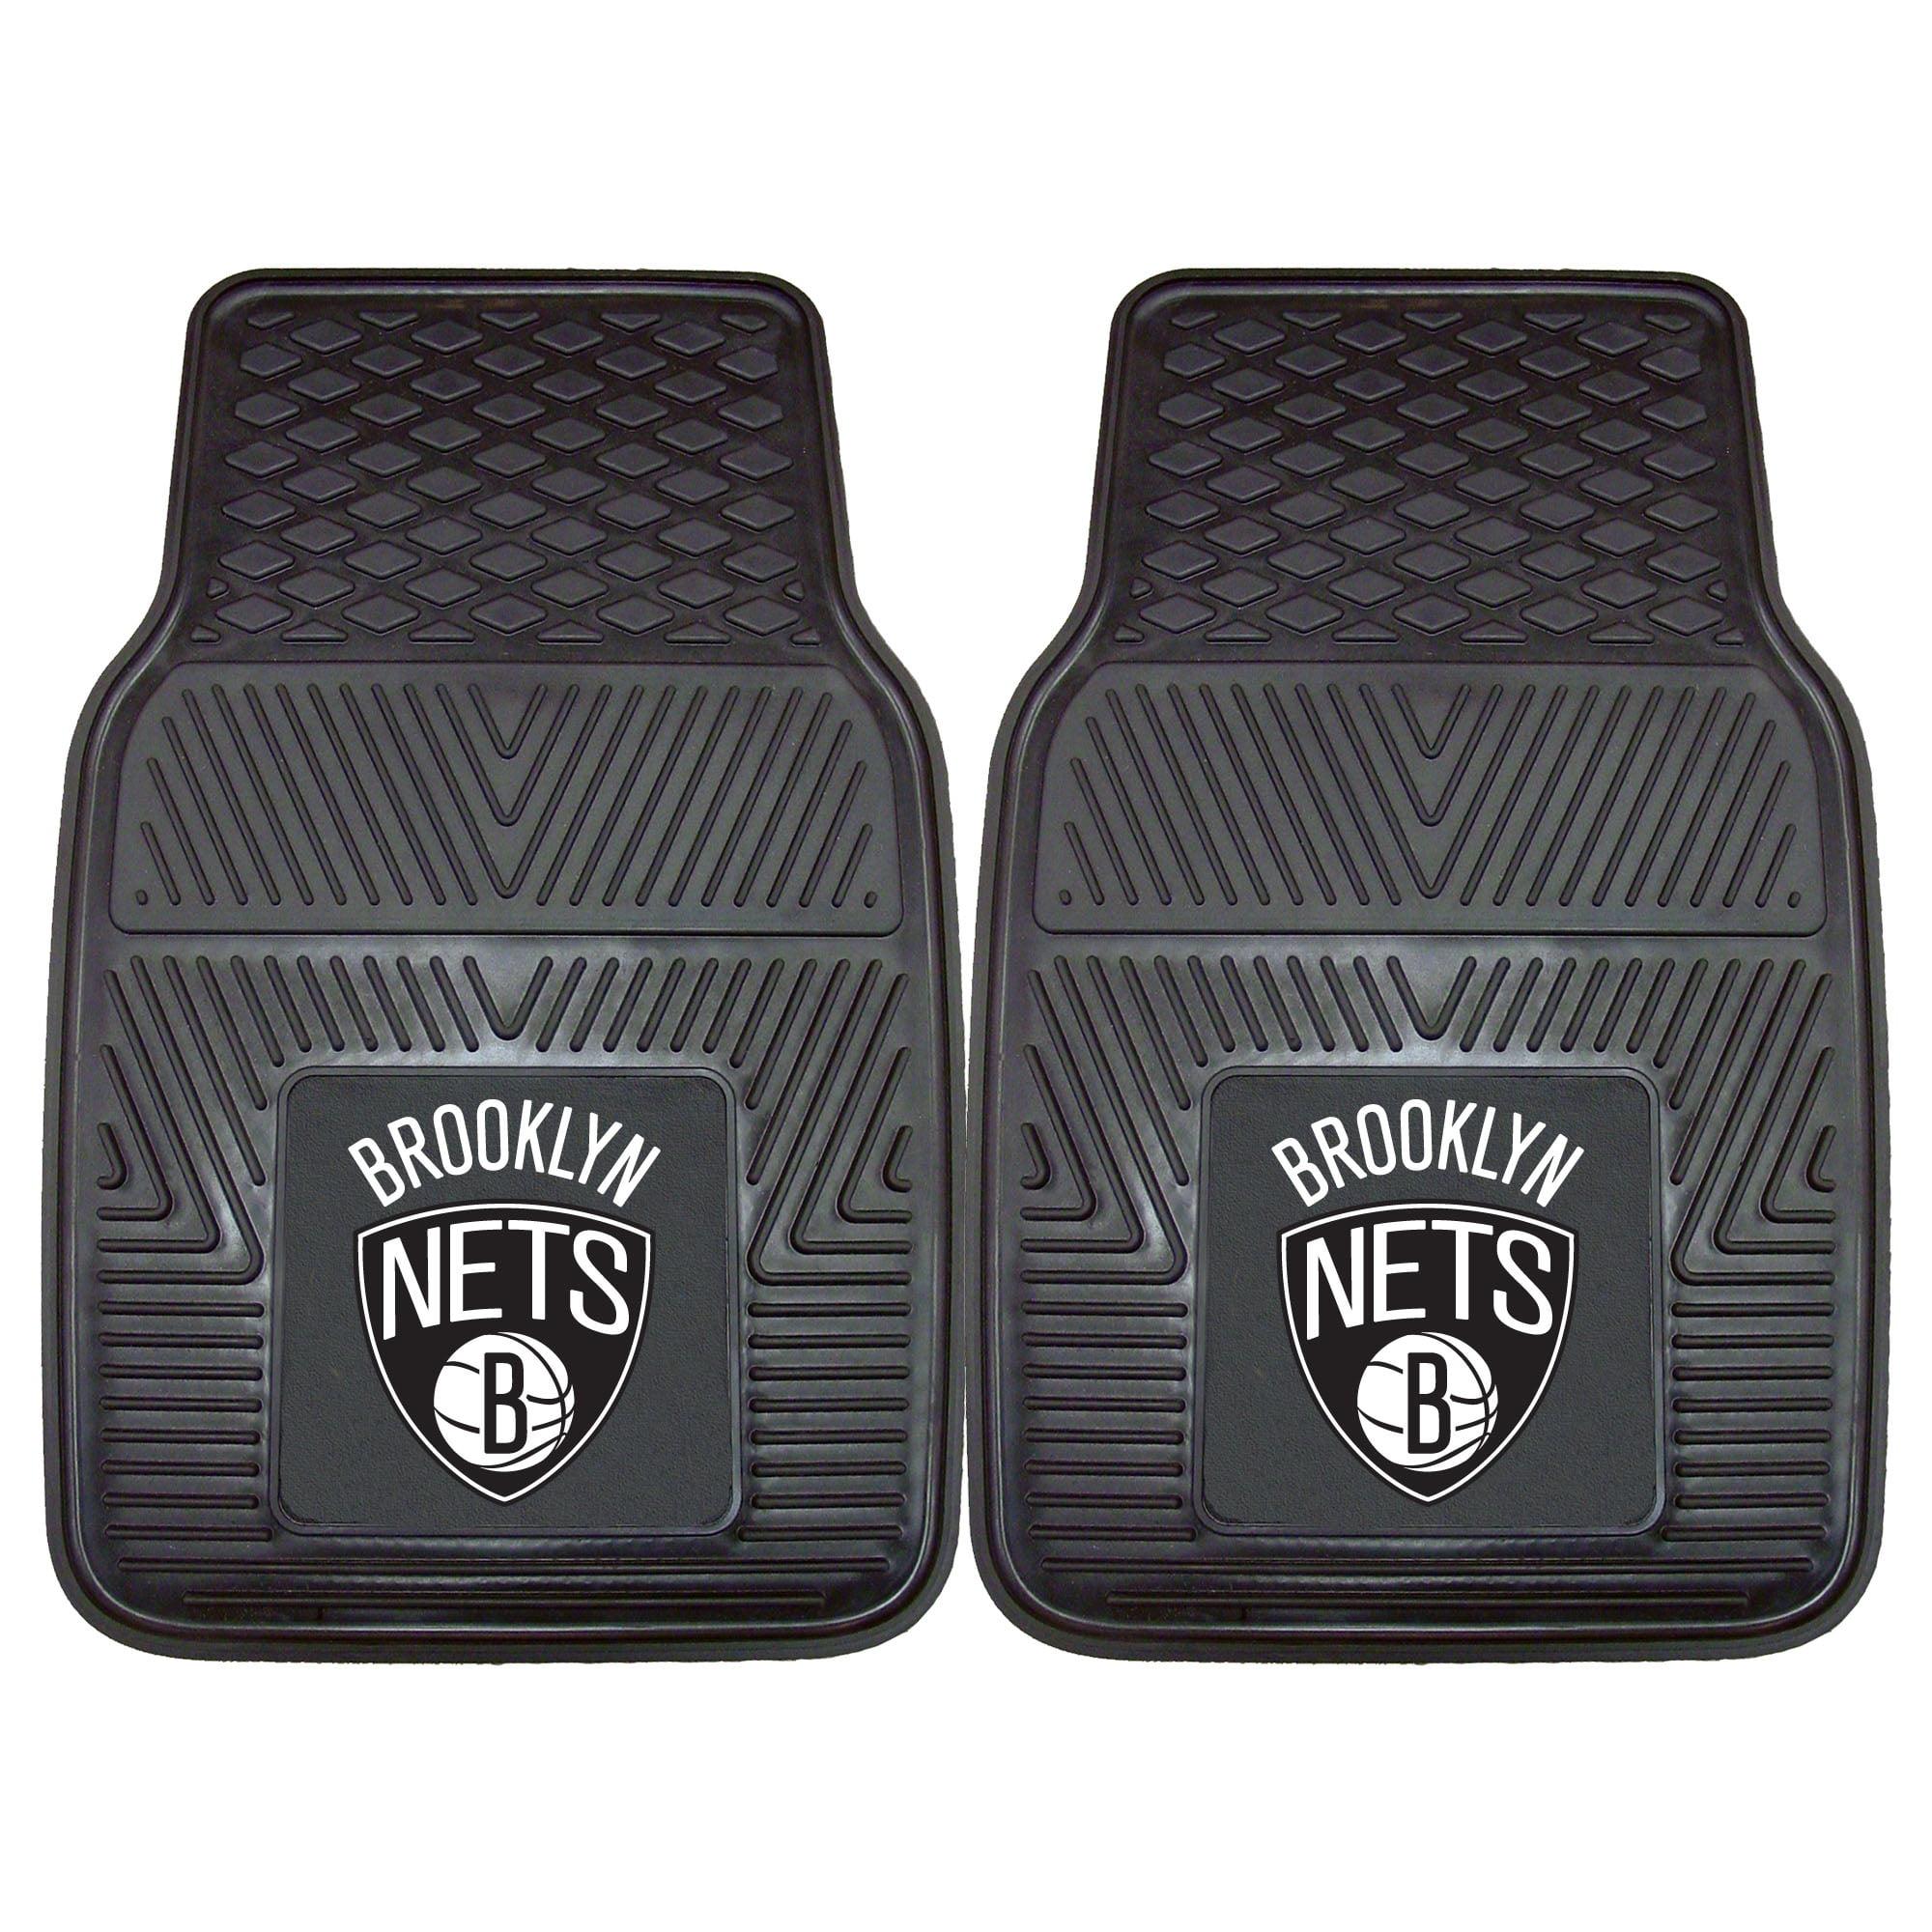 NBA Brooklyn Nets 2-PC Vinyl Front Car Mat Set, Universal Size